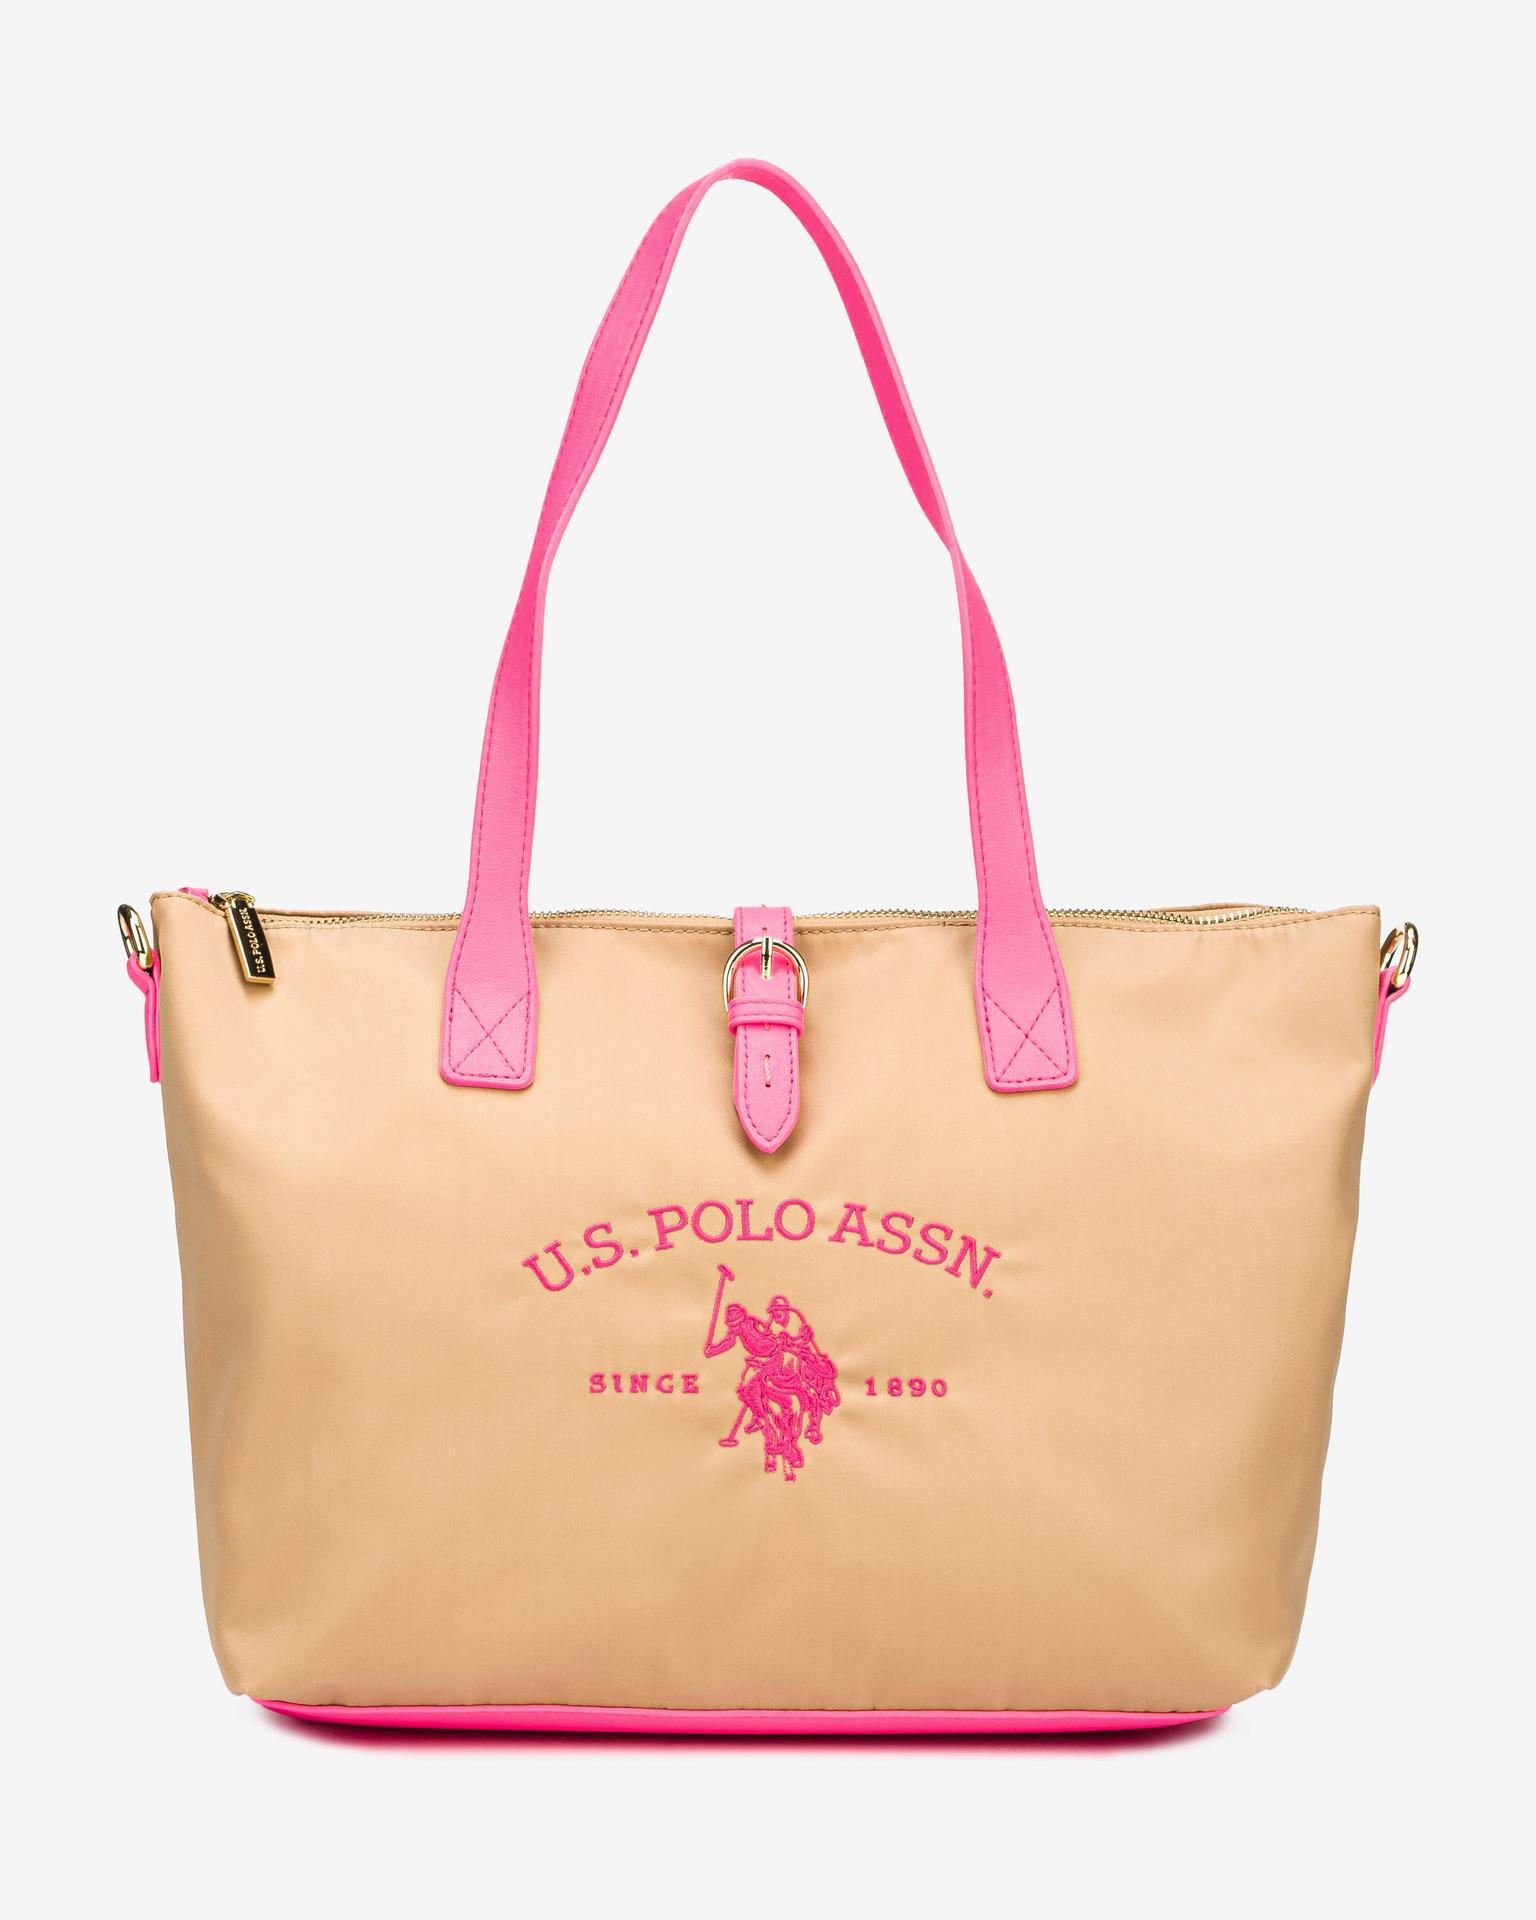 U.S. Polo Assn. Borsetta donna beige  Fluo